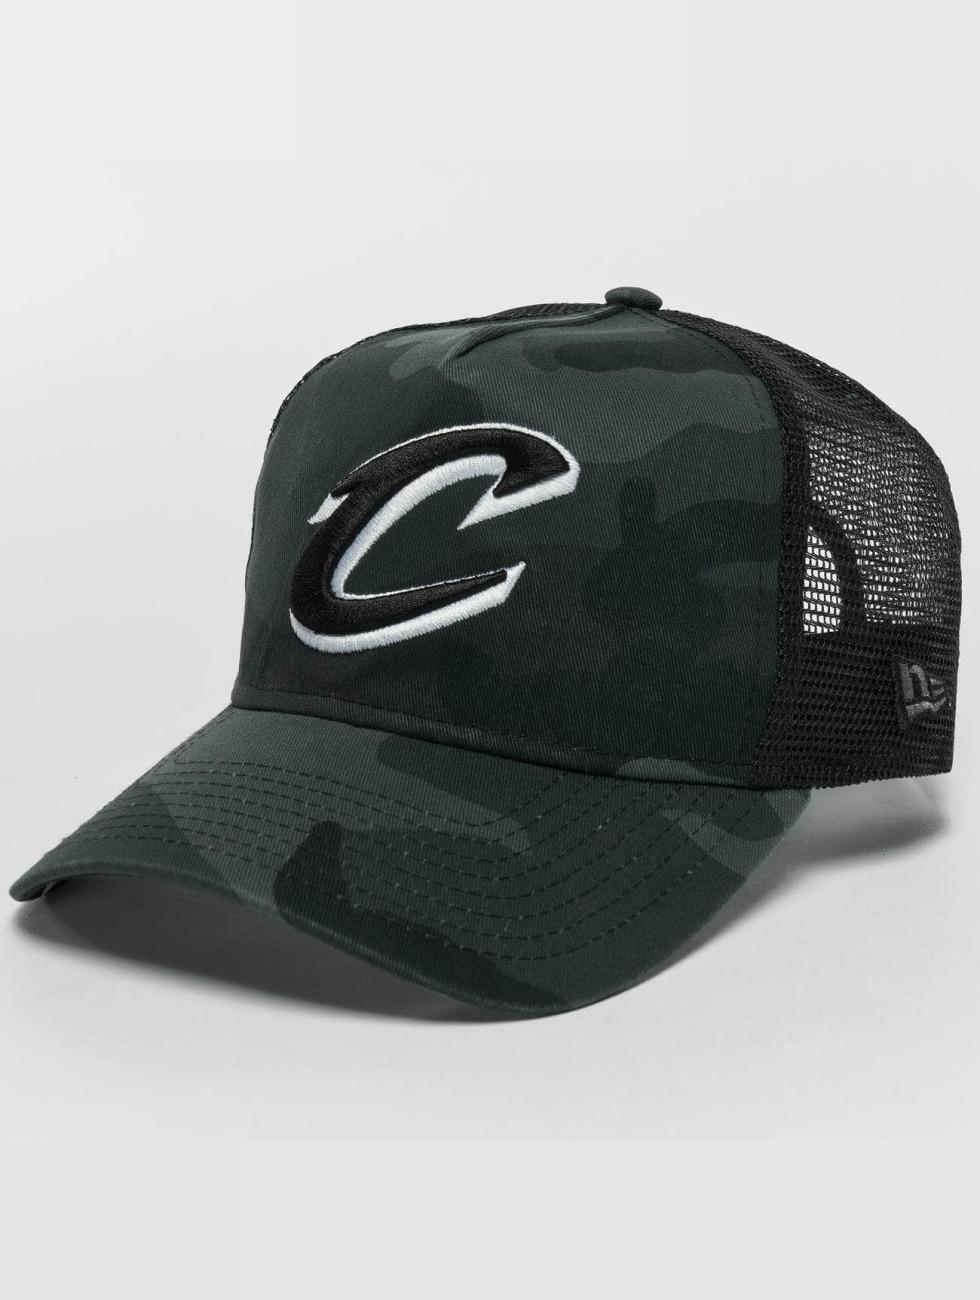 New Era Gorra Trucker Washed Camo Cleveland Cavaliers Trucker Cap camuflaje